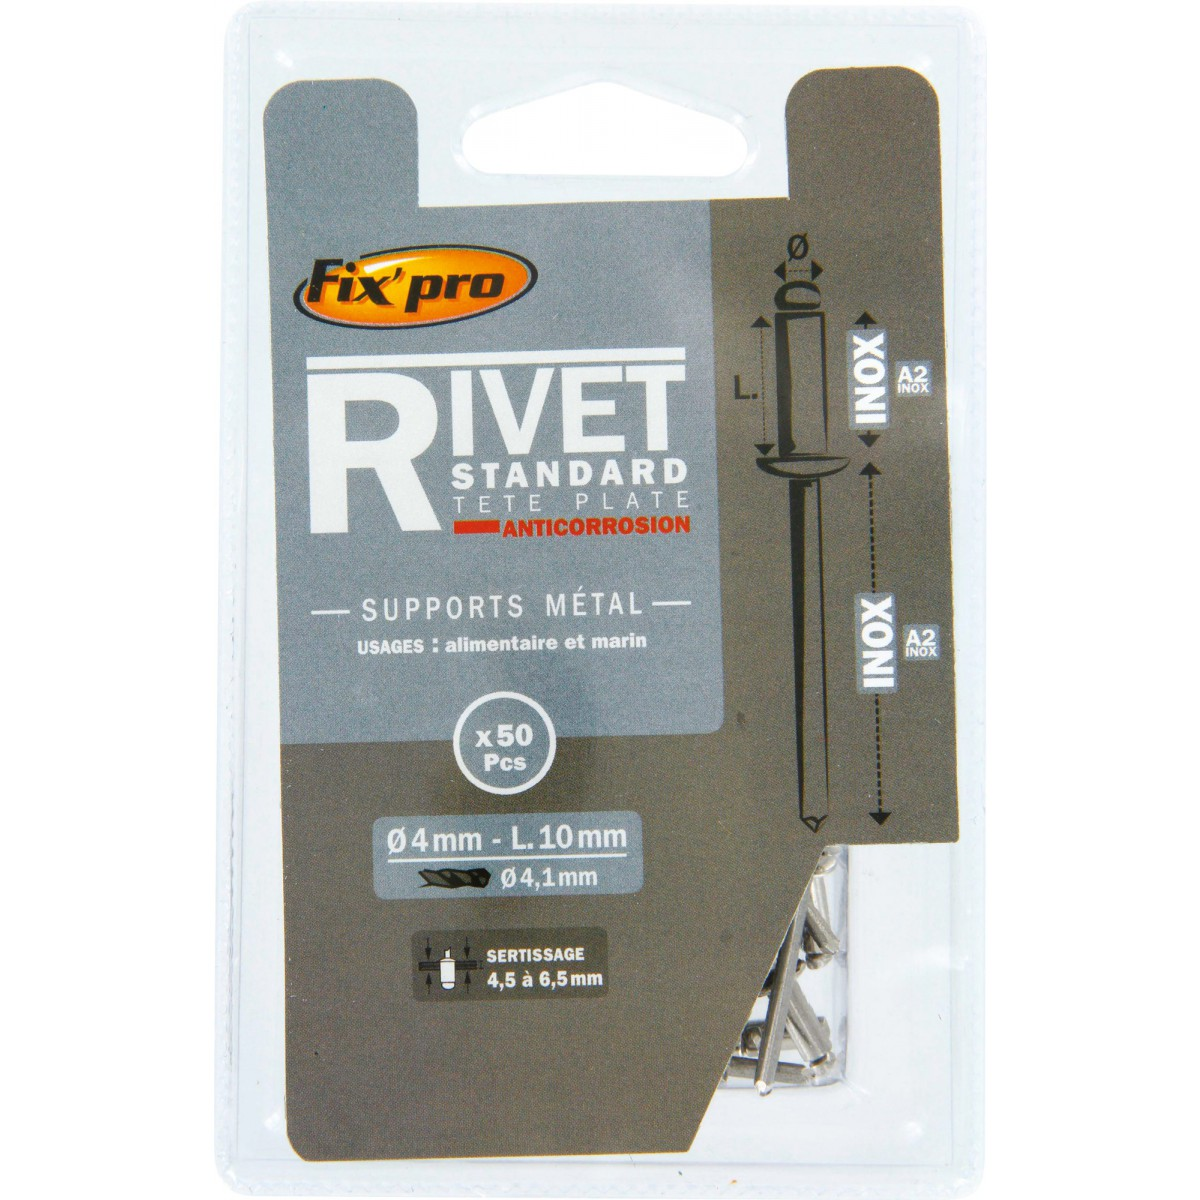 Rivet aveugle tête plate inox / inox A2 Fix'Pro - Longueur 10 mm - Diamètre 4 mm - Vendu par 50